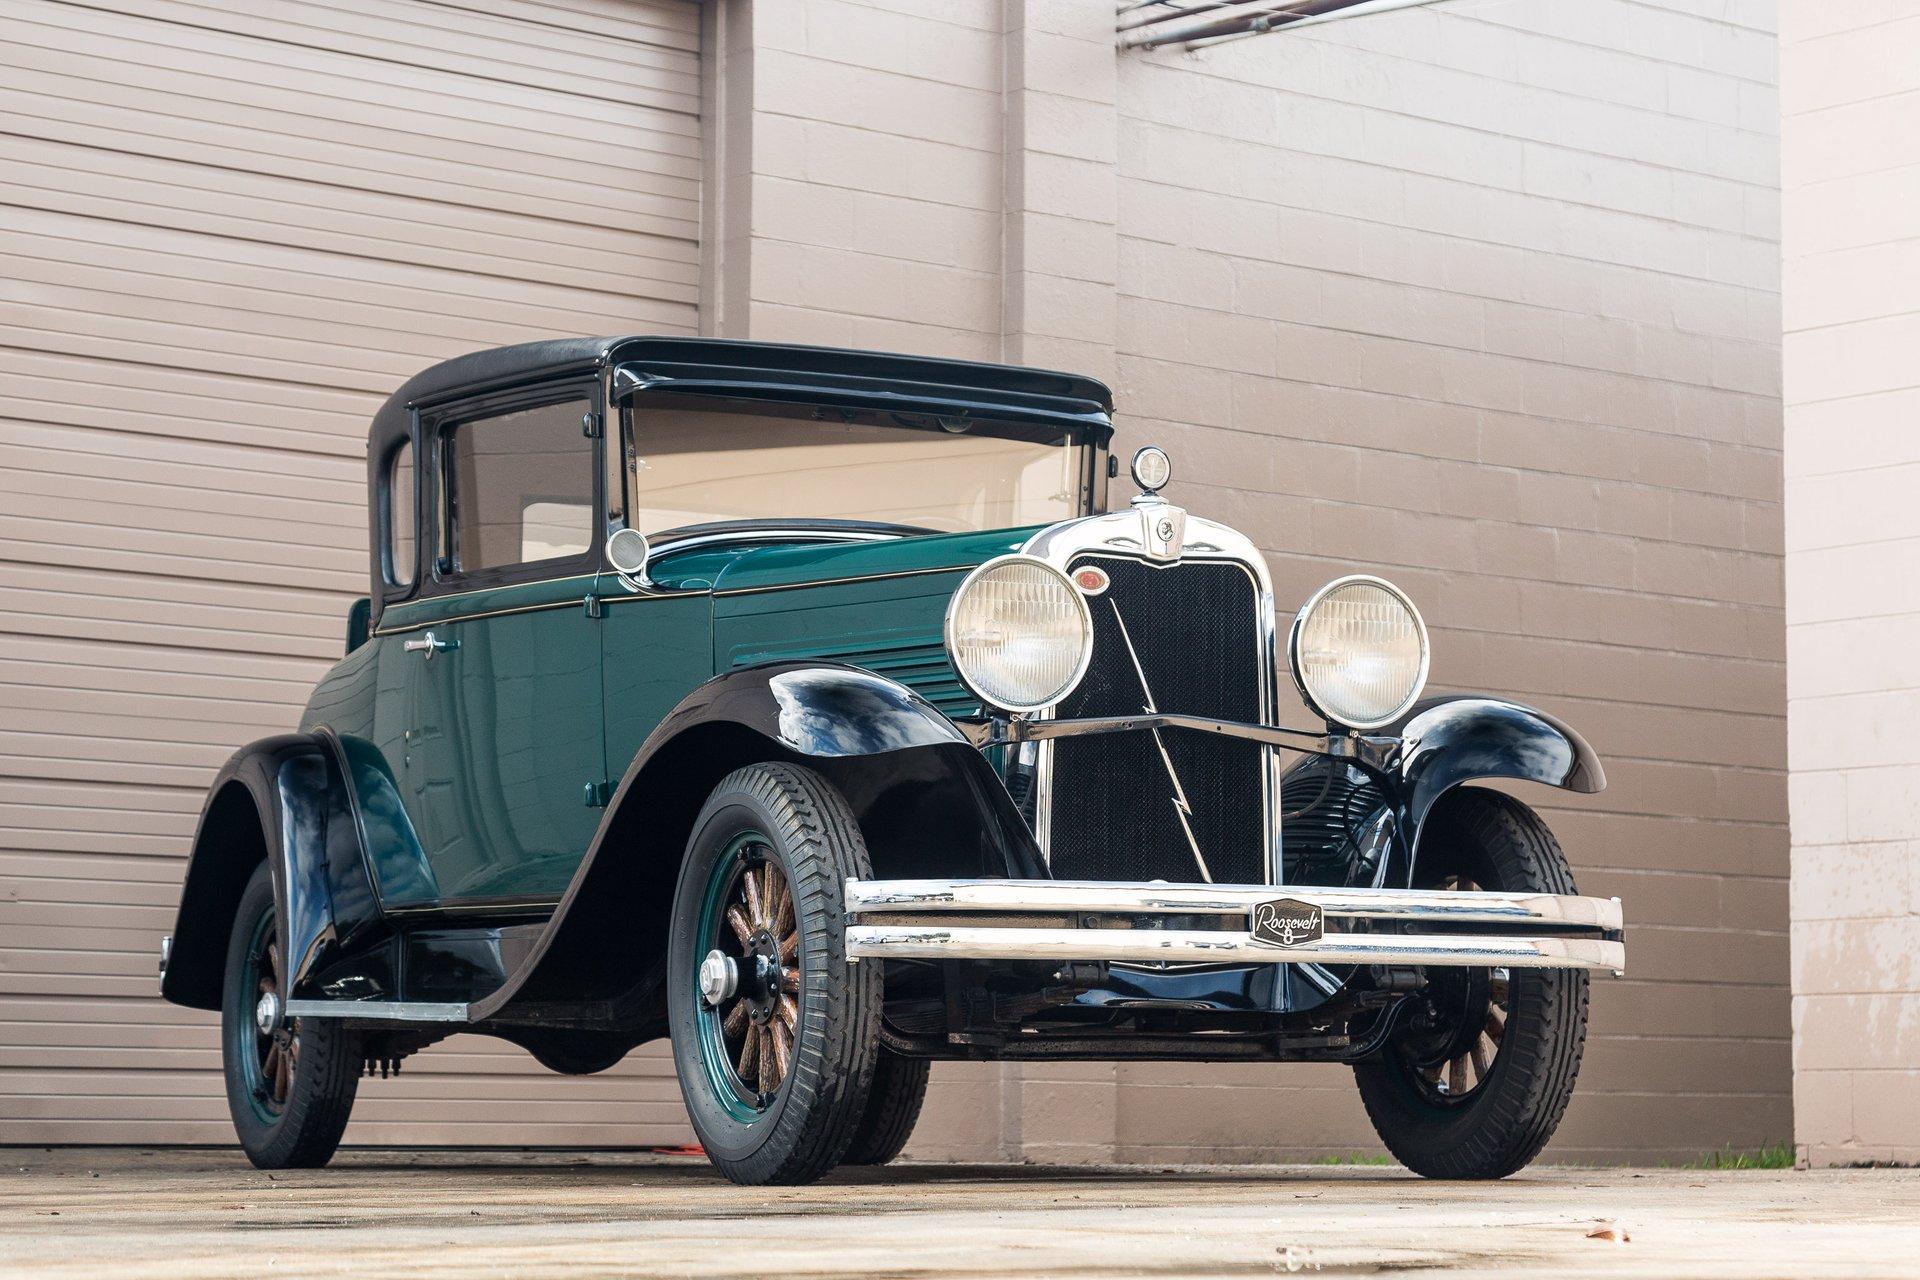 1929 Roosevelt 5 Window Coupe